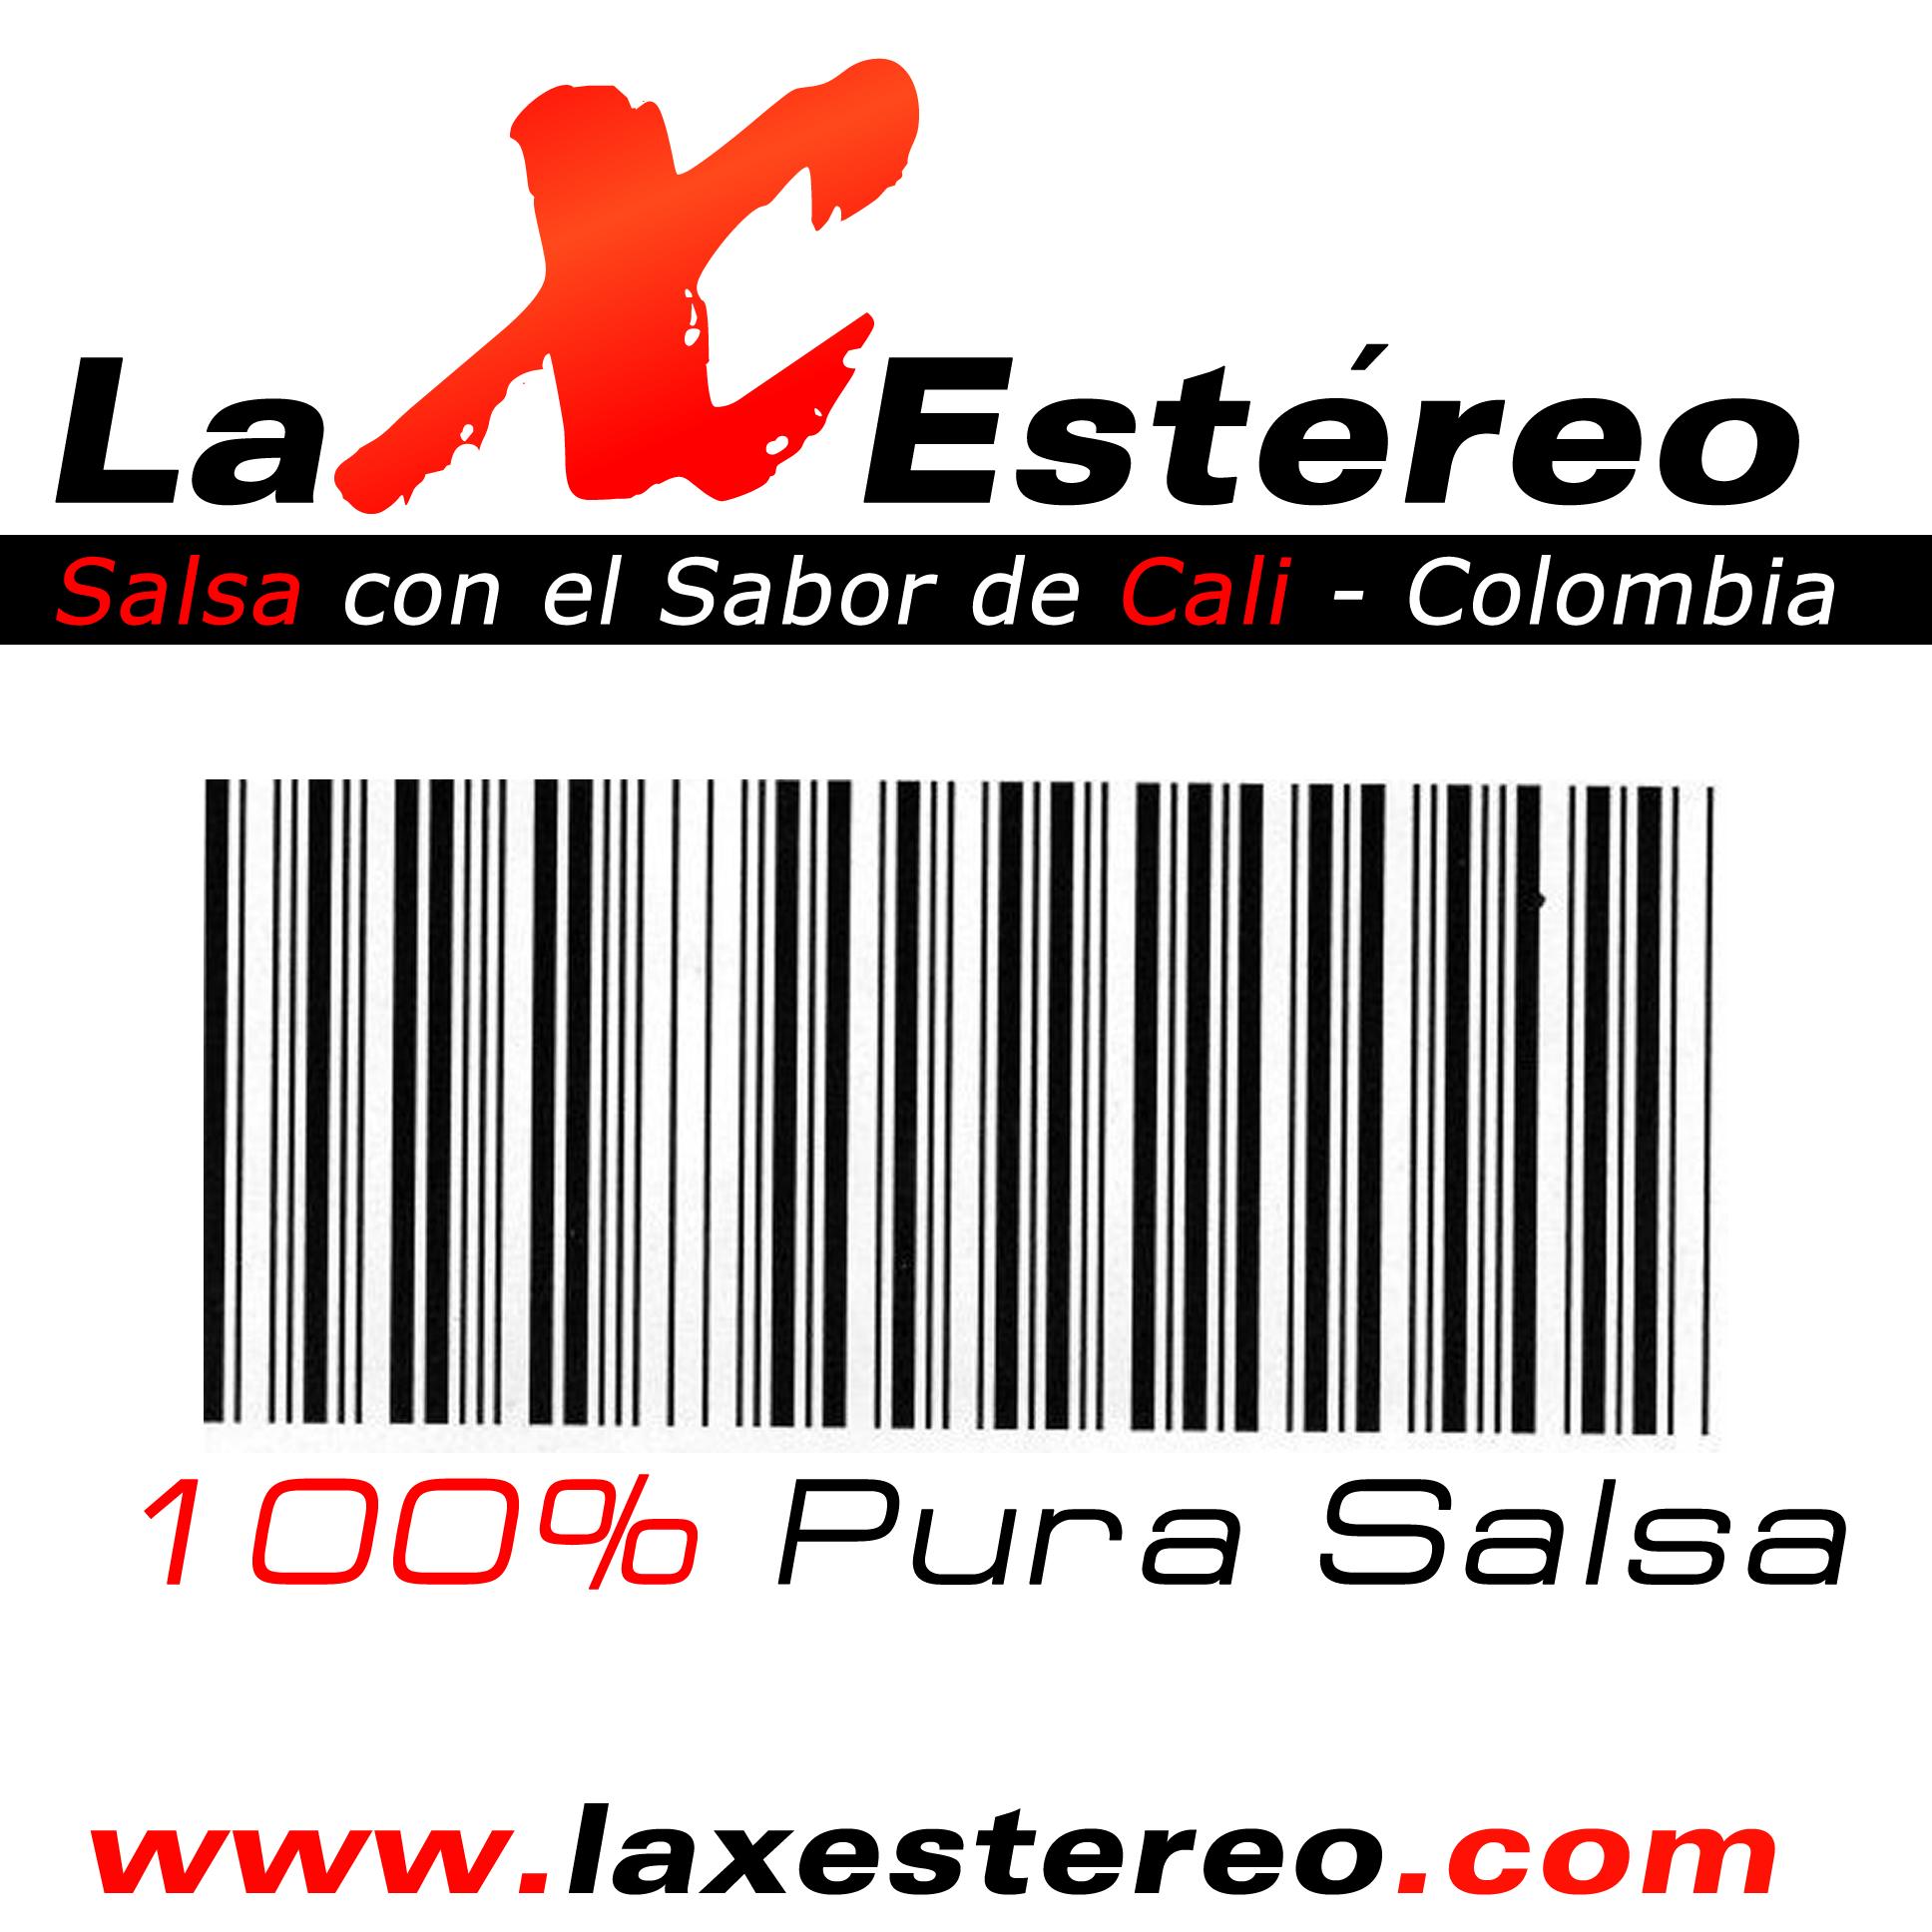 La X Estereo - 100% Pura Salsa - 256K